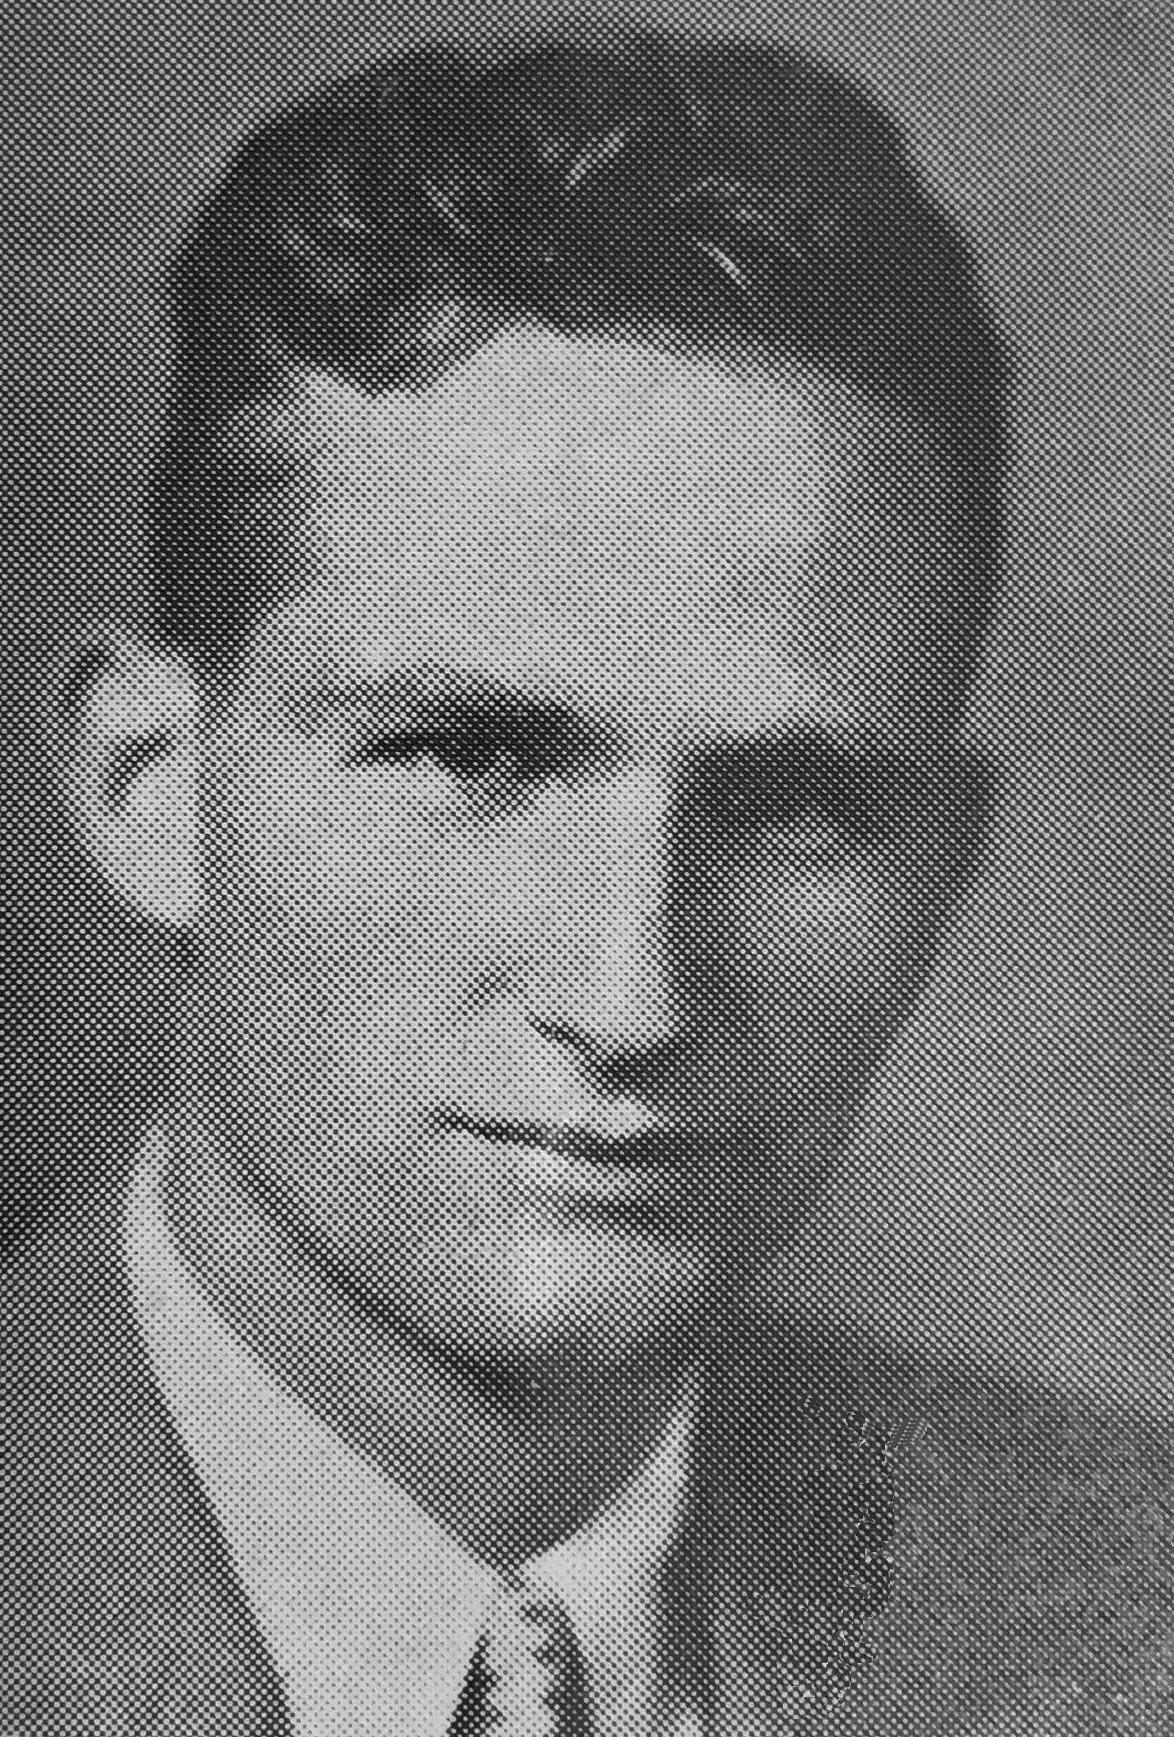 Beesley, Sterling Ebenezer